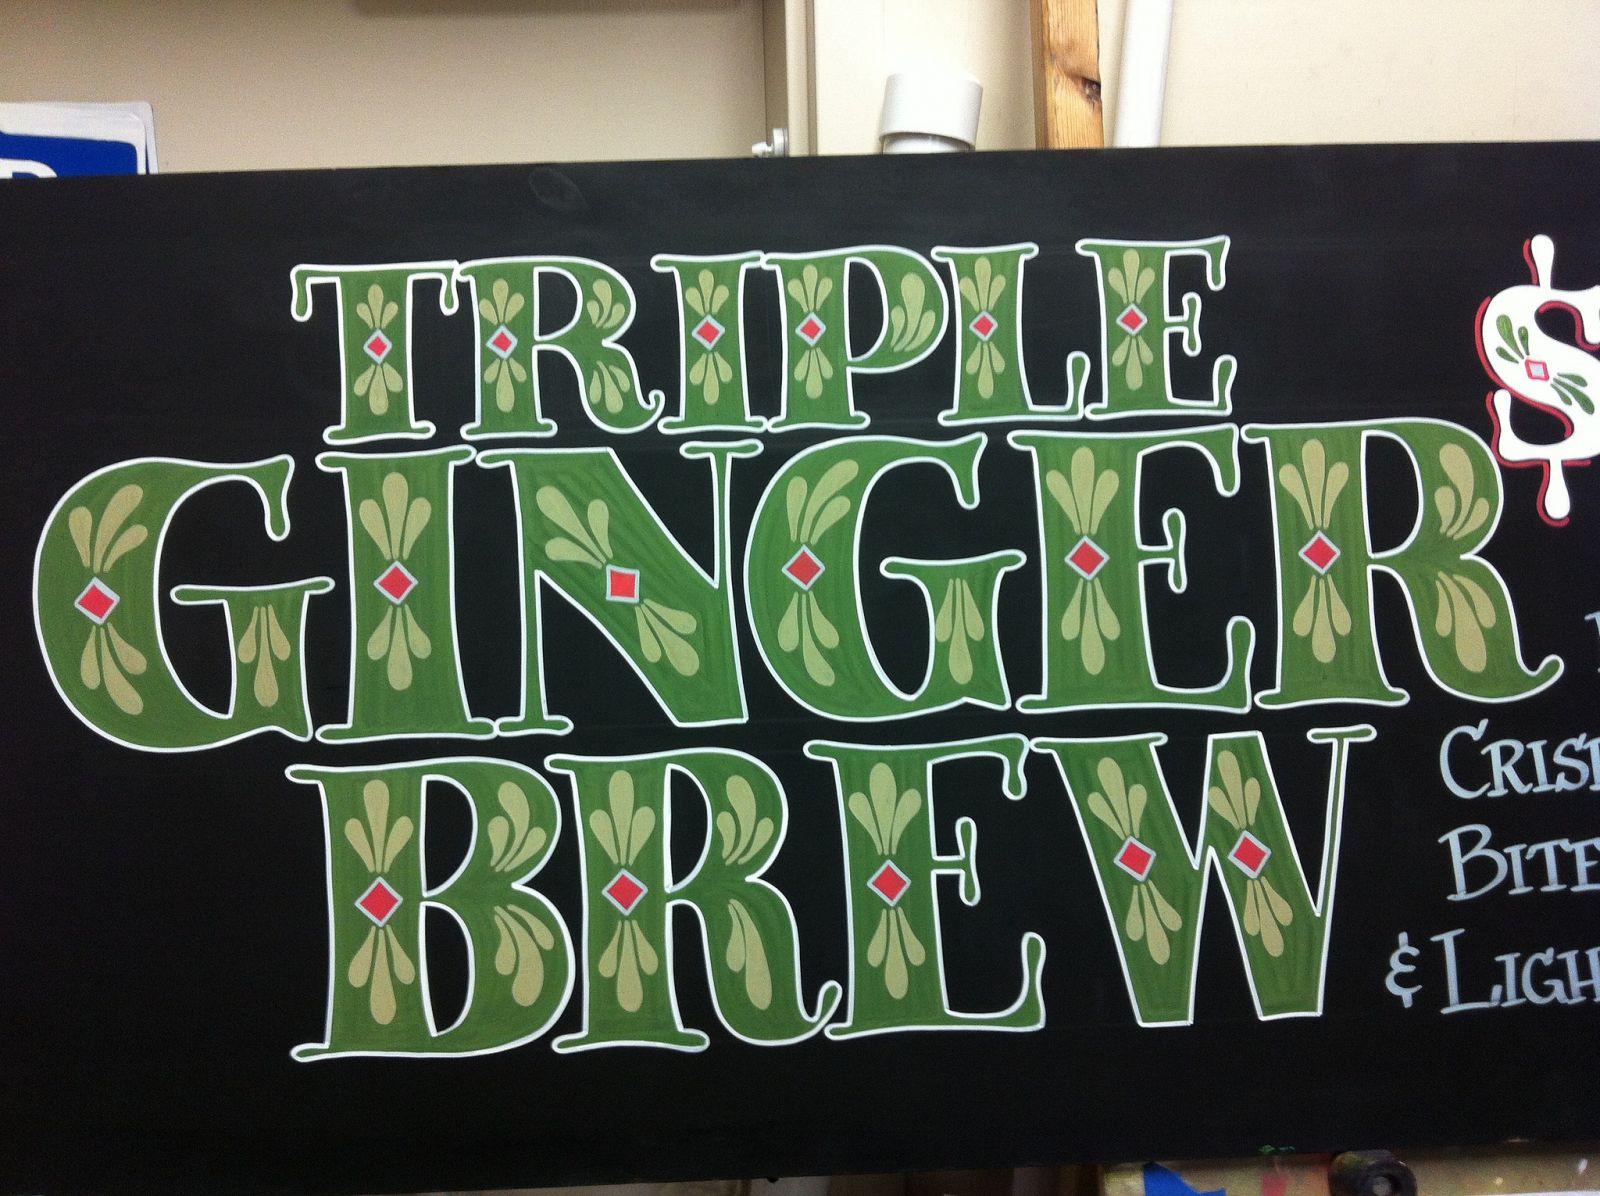 Ginger Brew by Katy Kristin